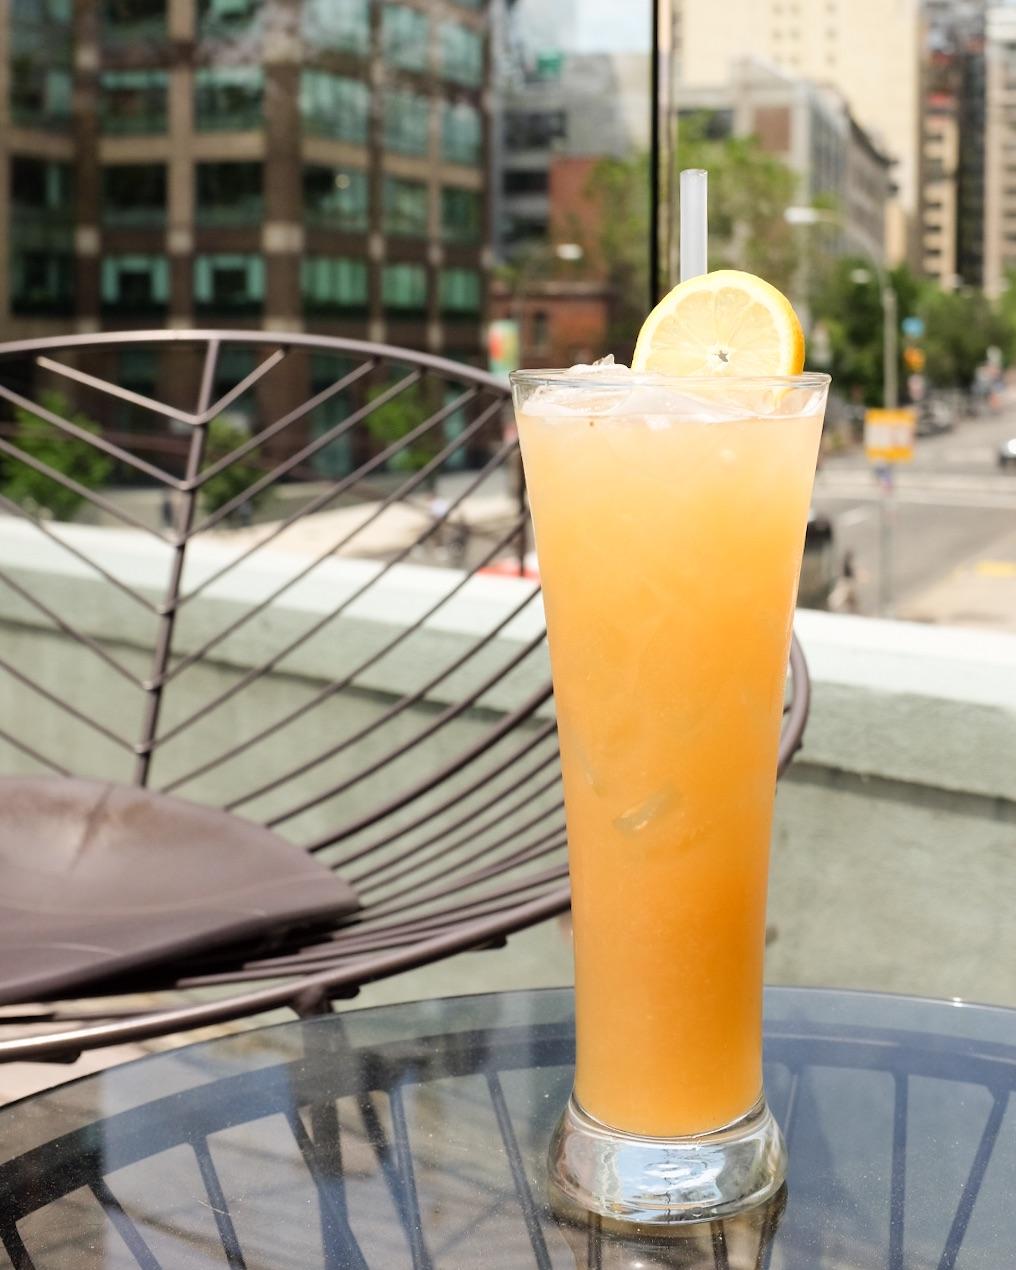 Gingerade cocktail at David Burke Kitchen